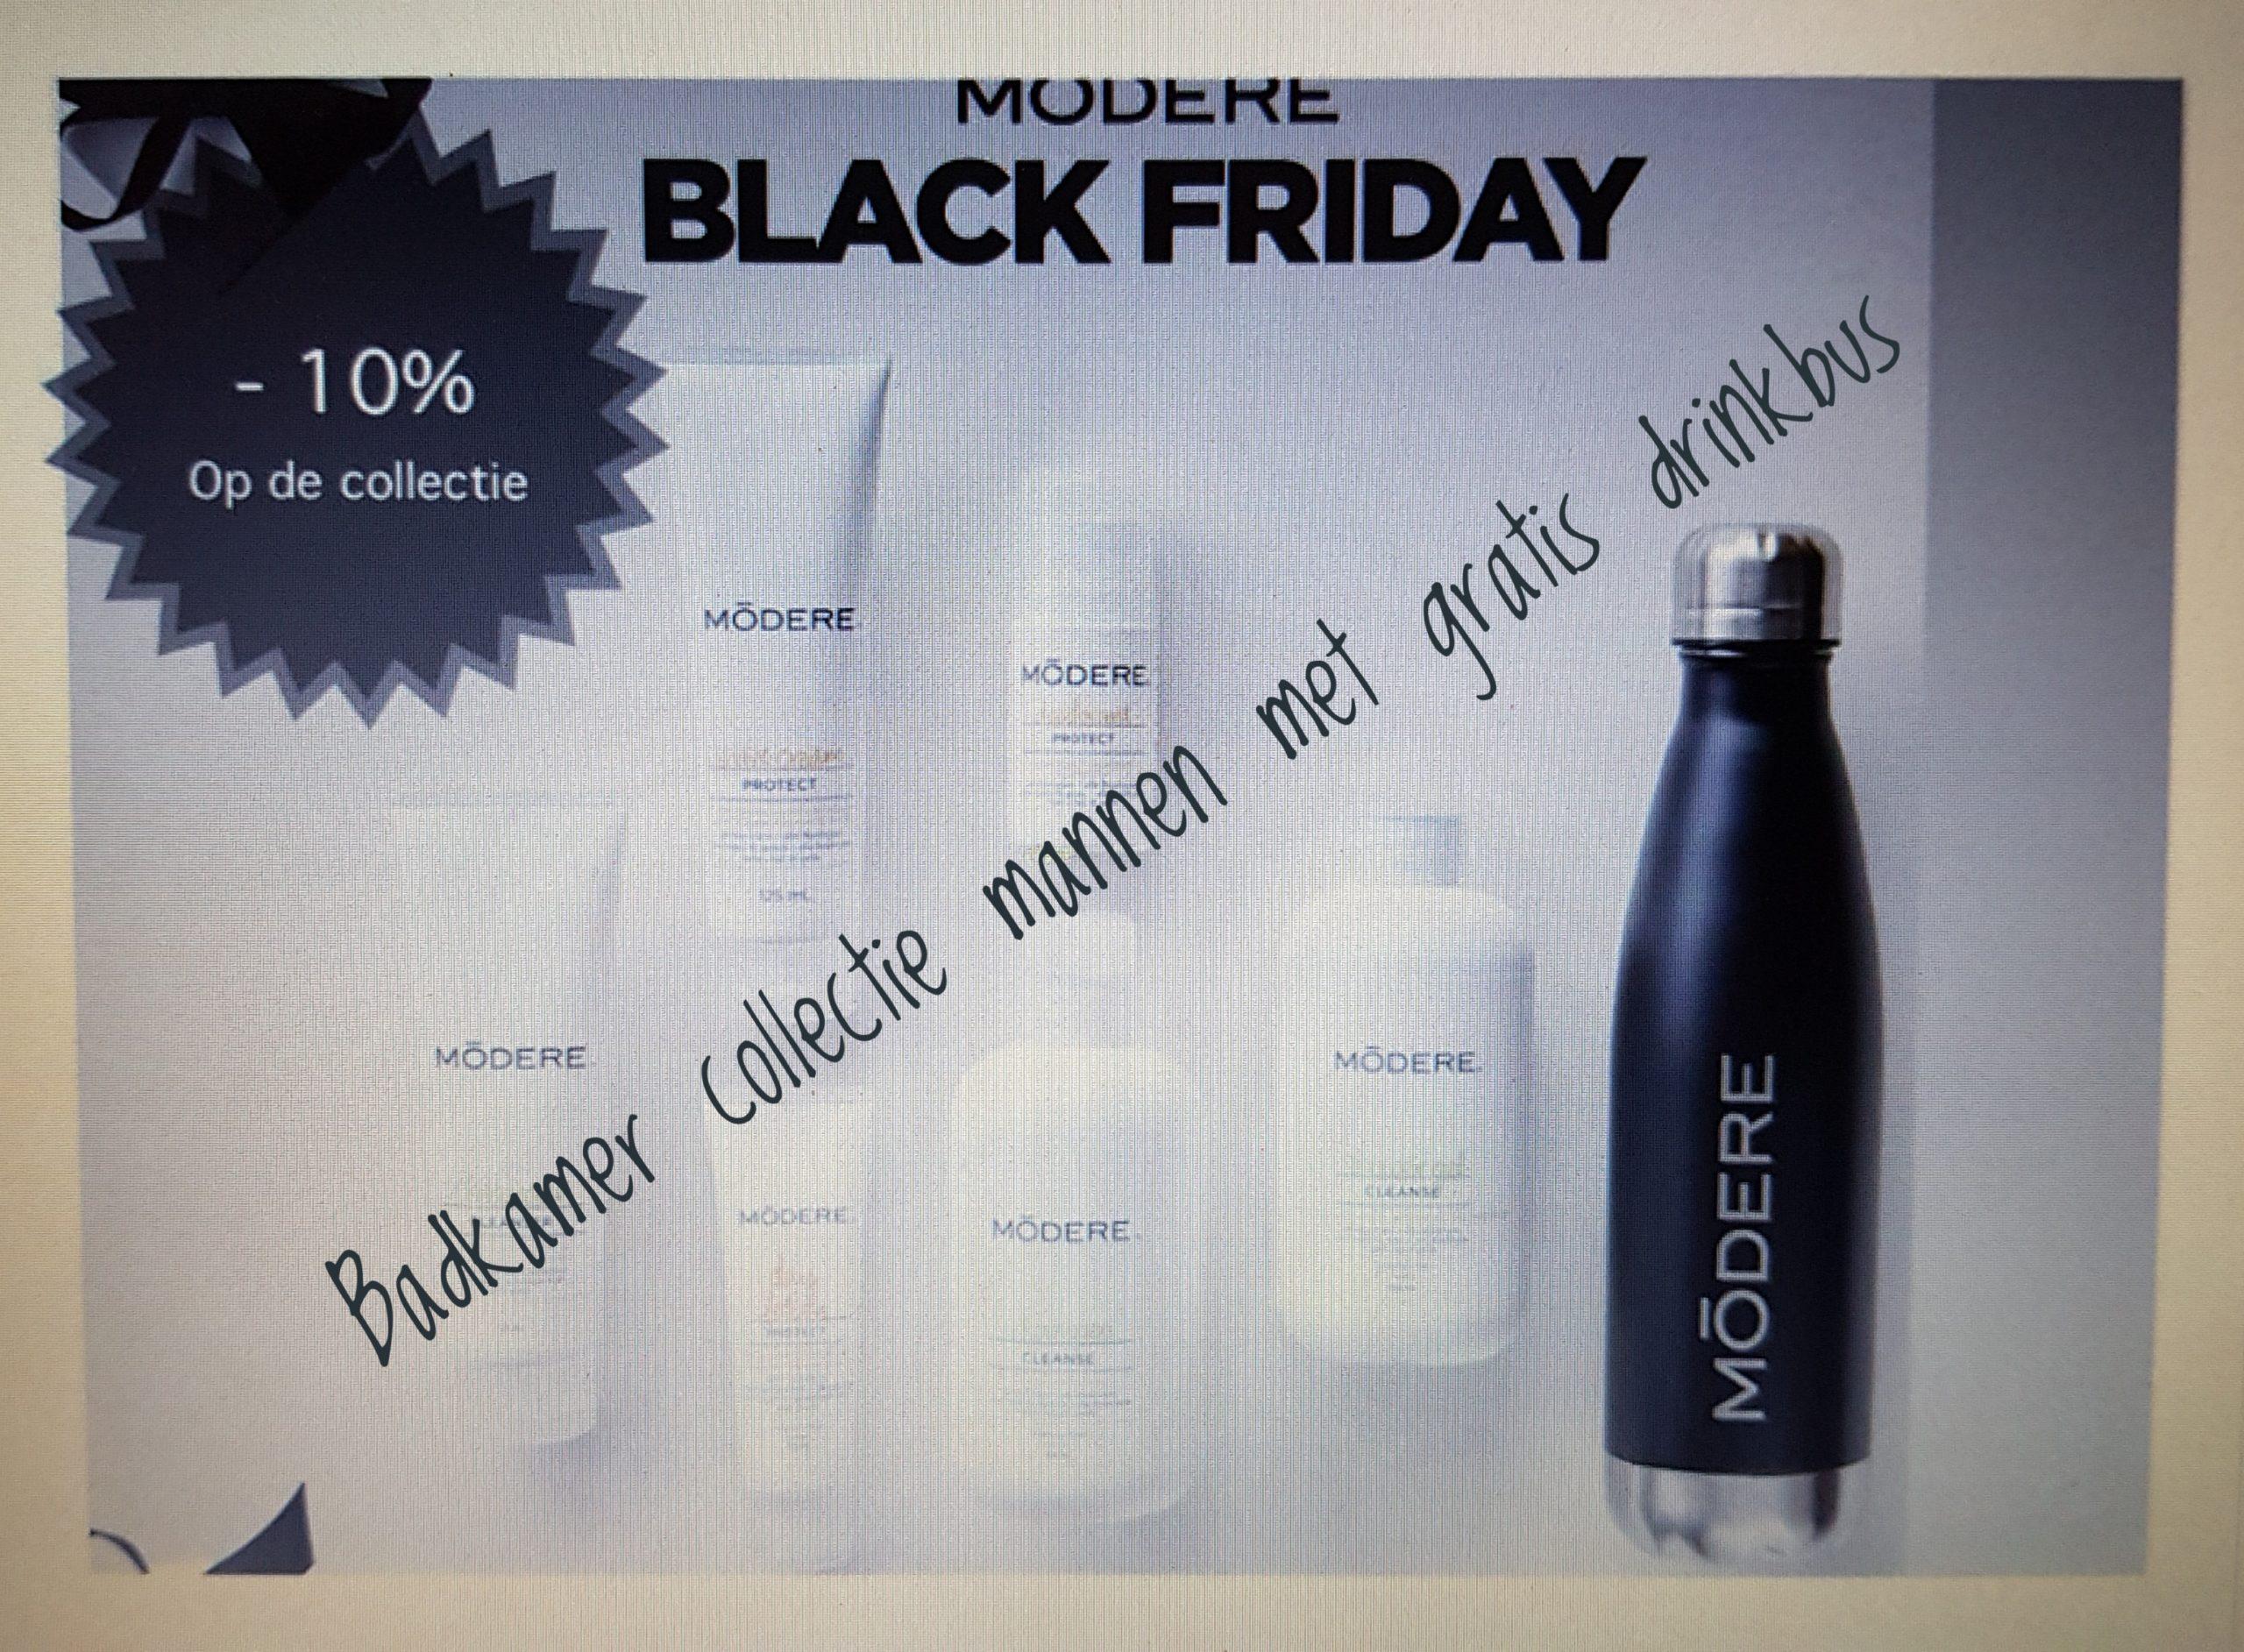 modere black friday